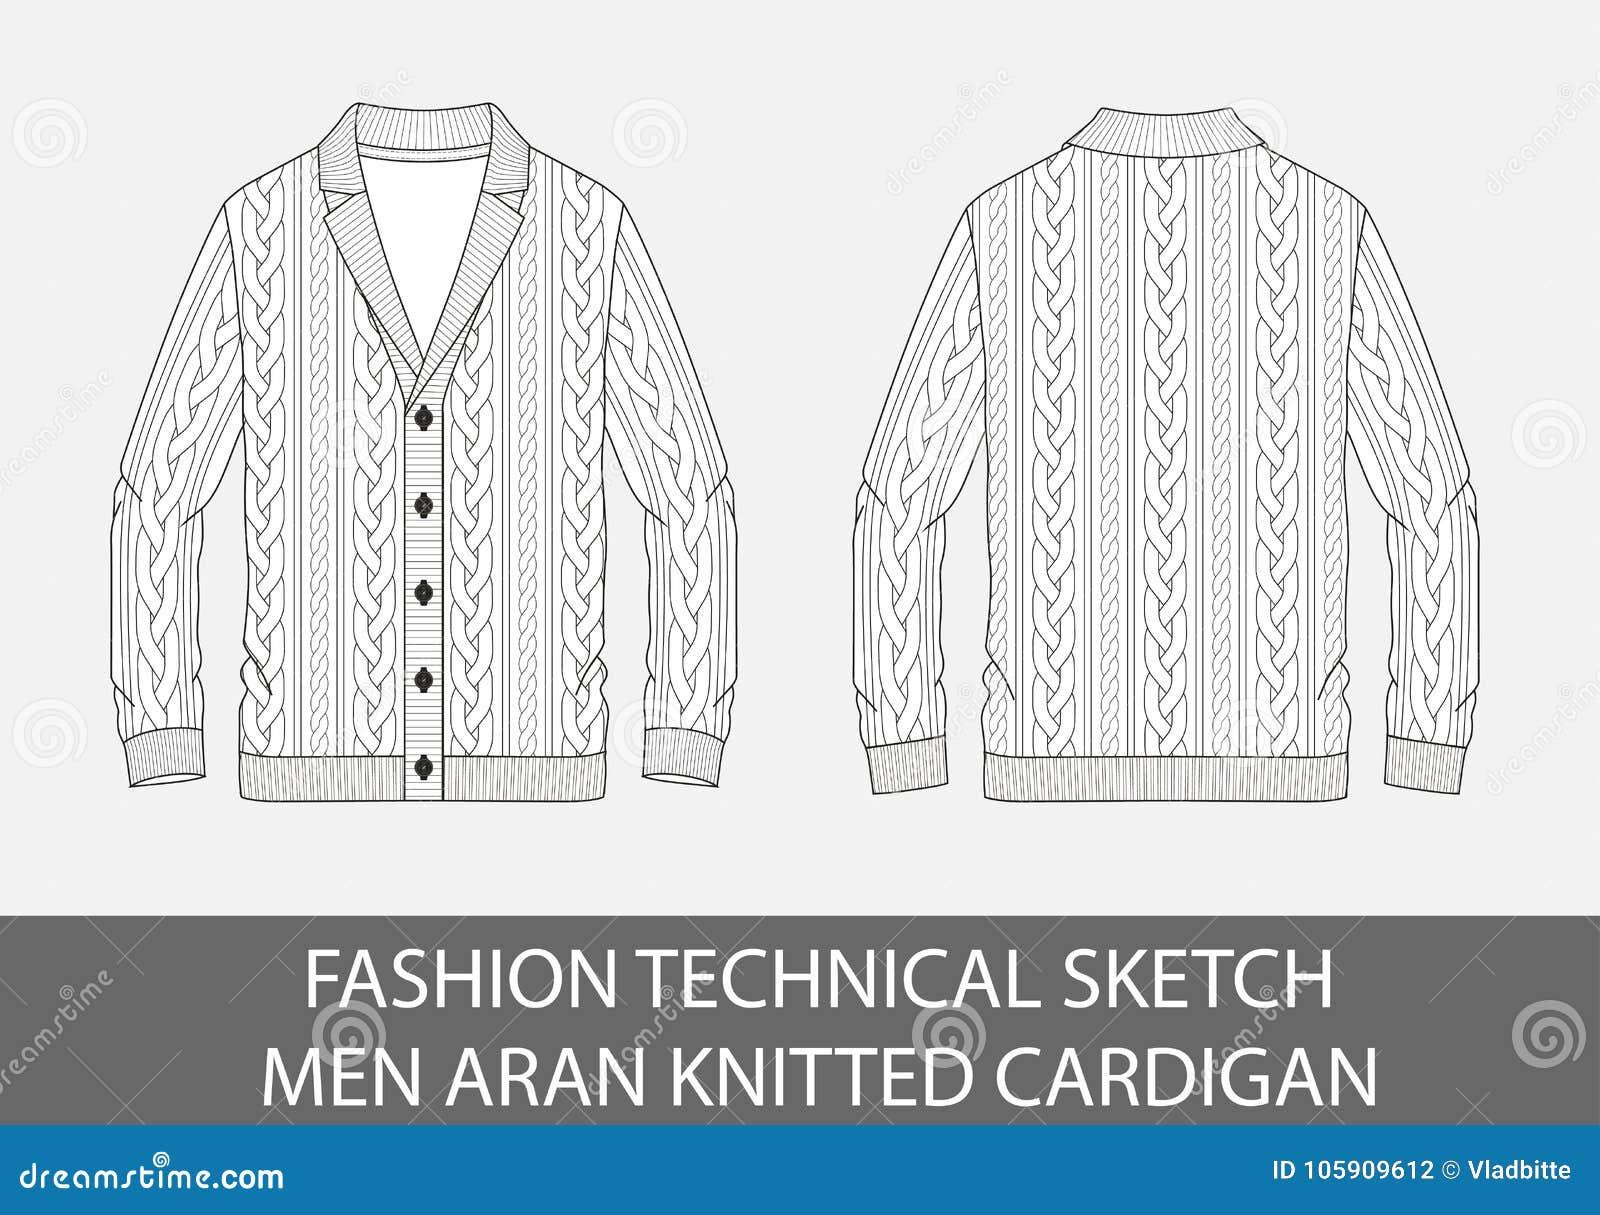 Люди эскиза моды технические вяжут кардиган aran одно--breasted